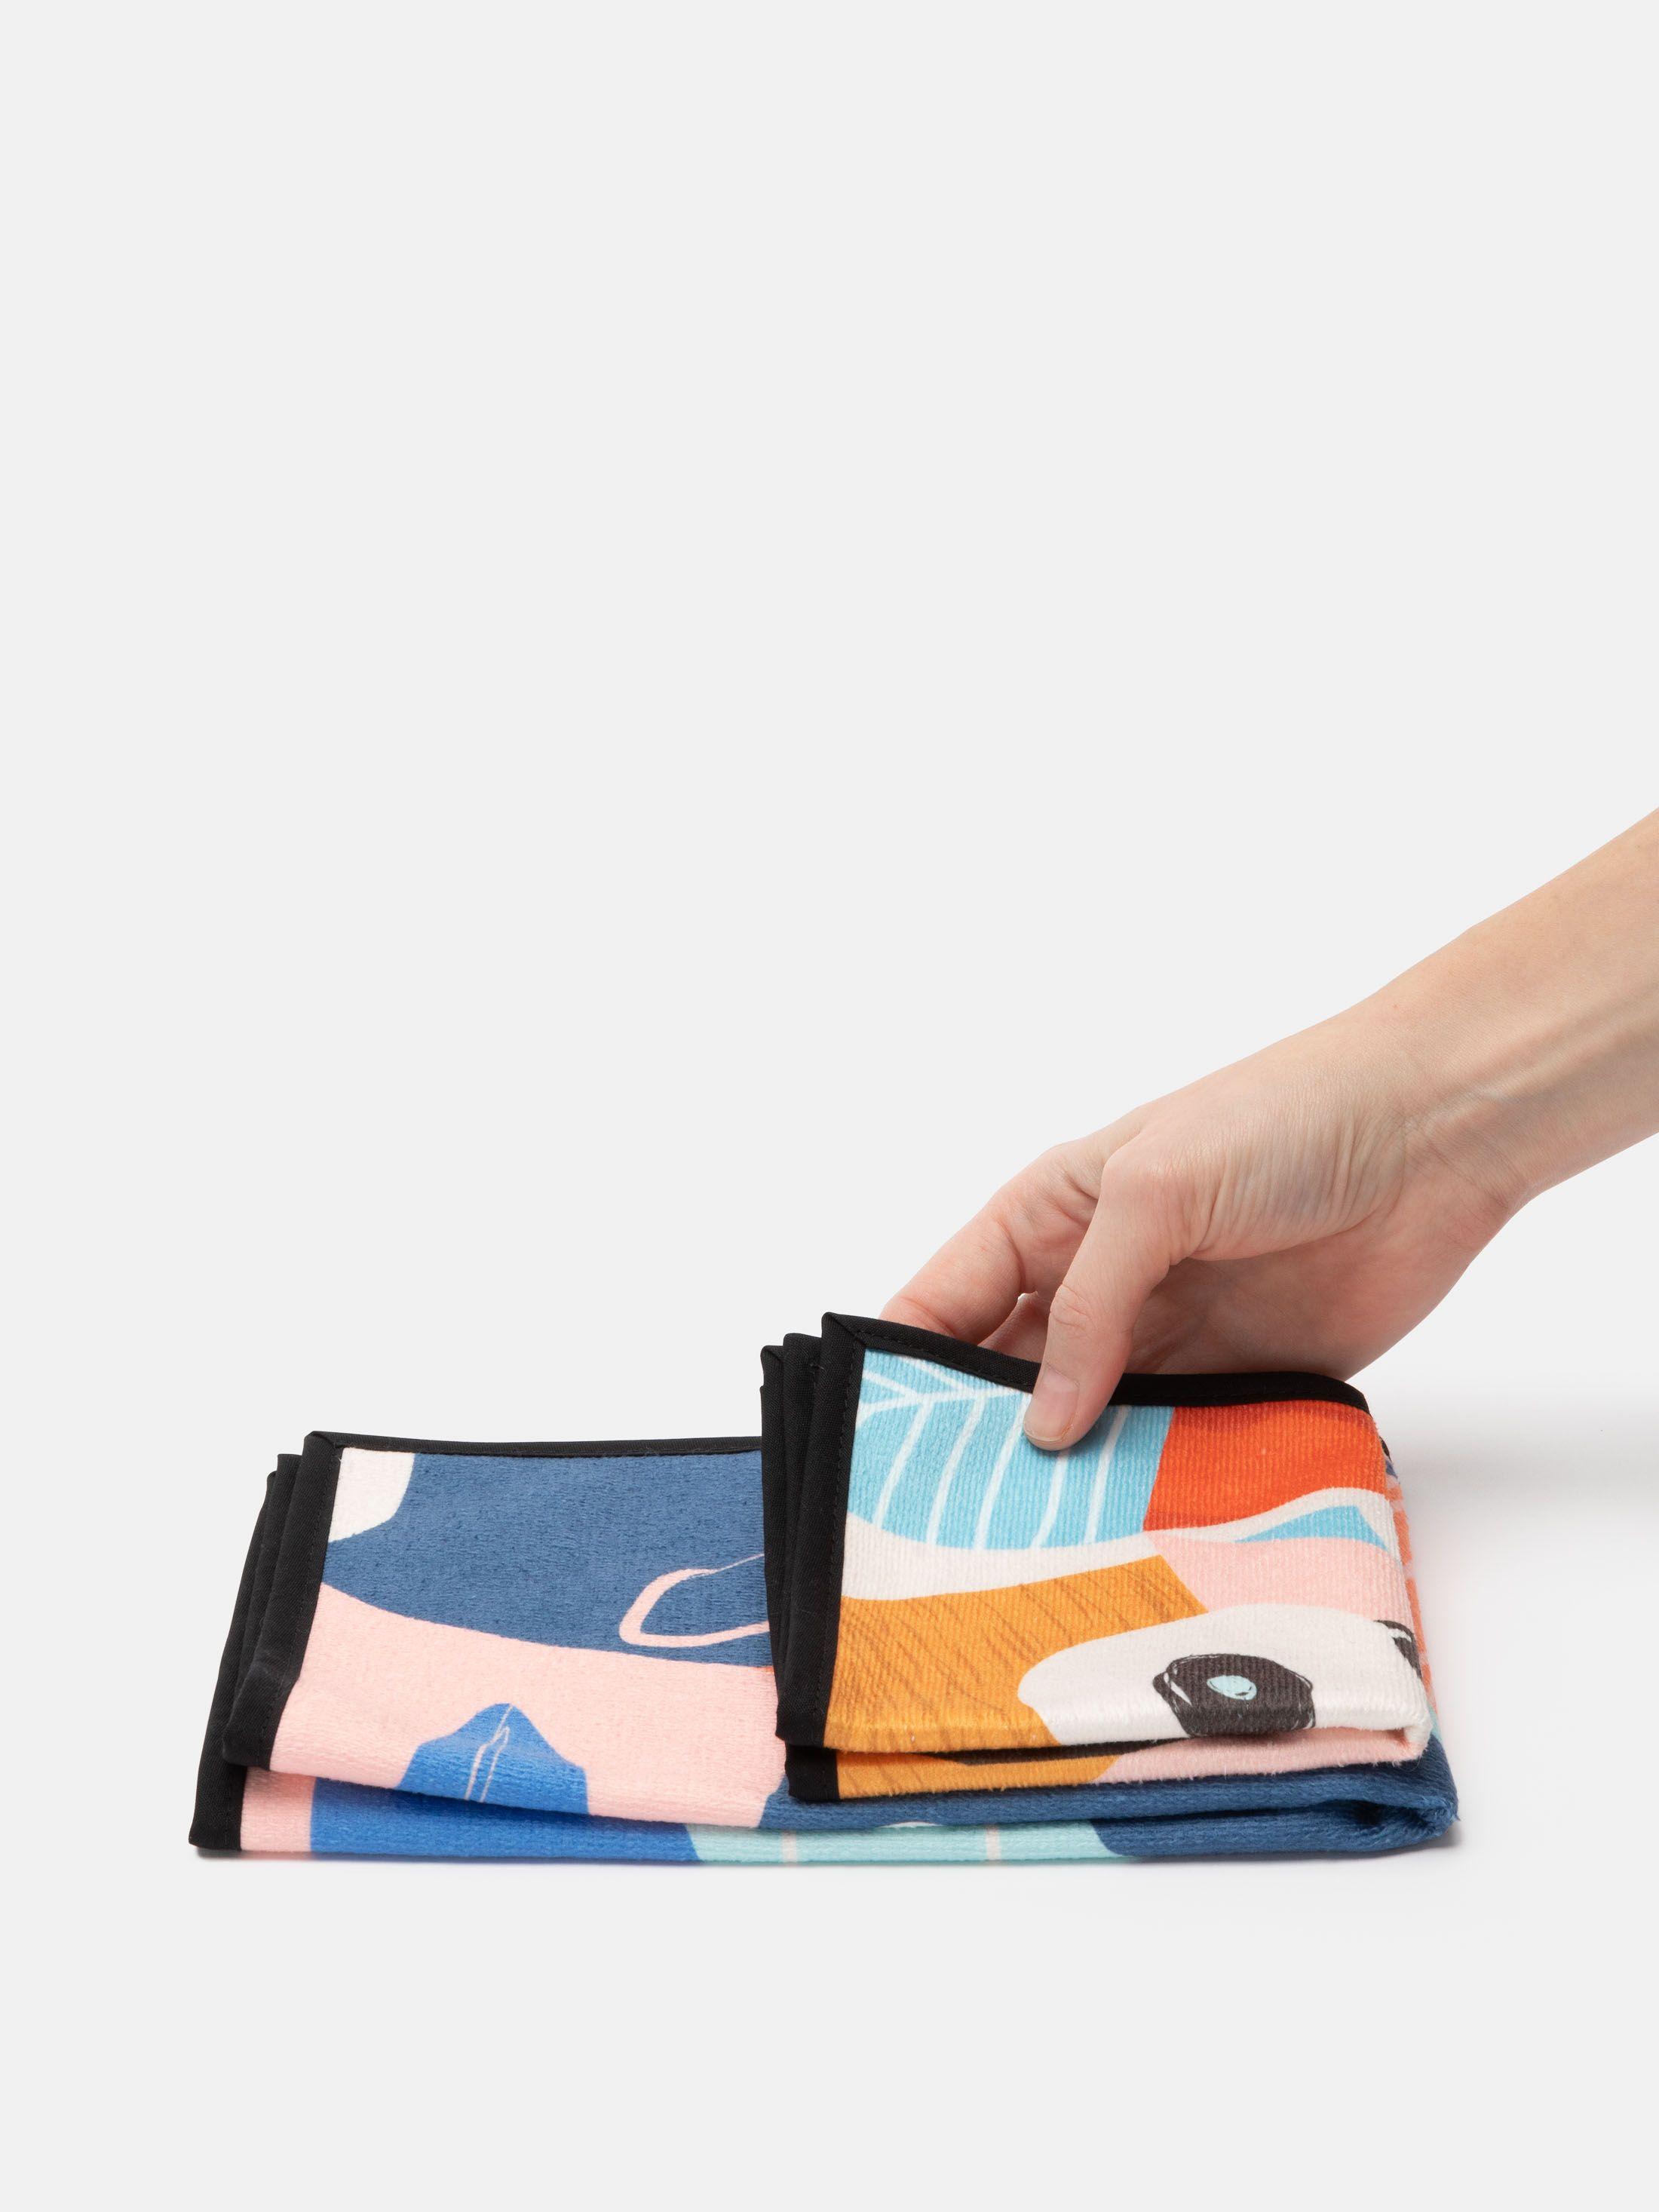 gepersonaliseerde handdoekenset met gekleurde rand